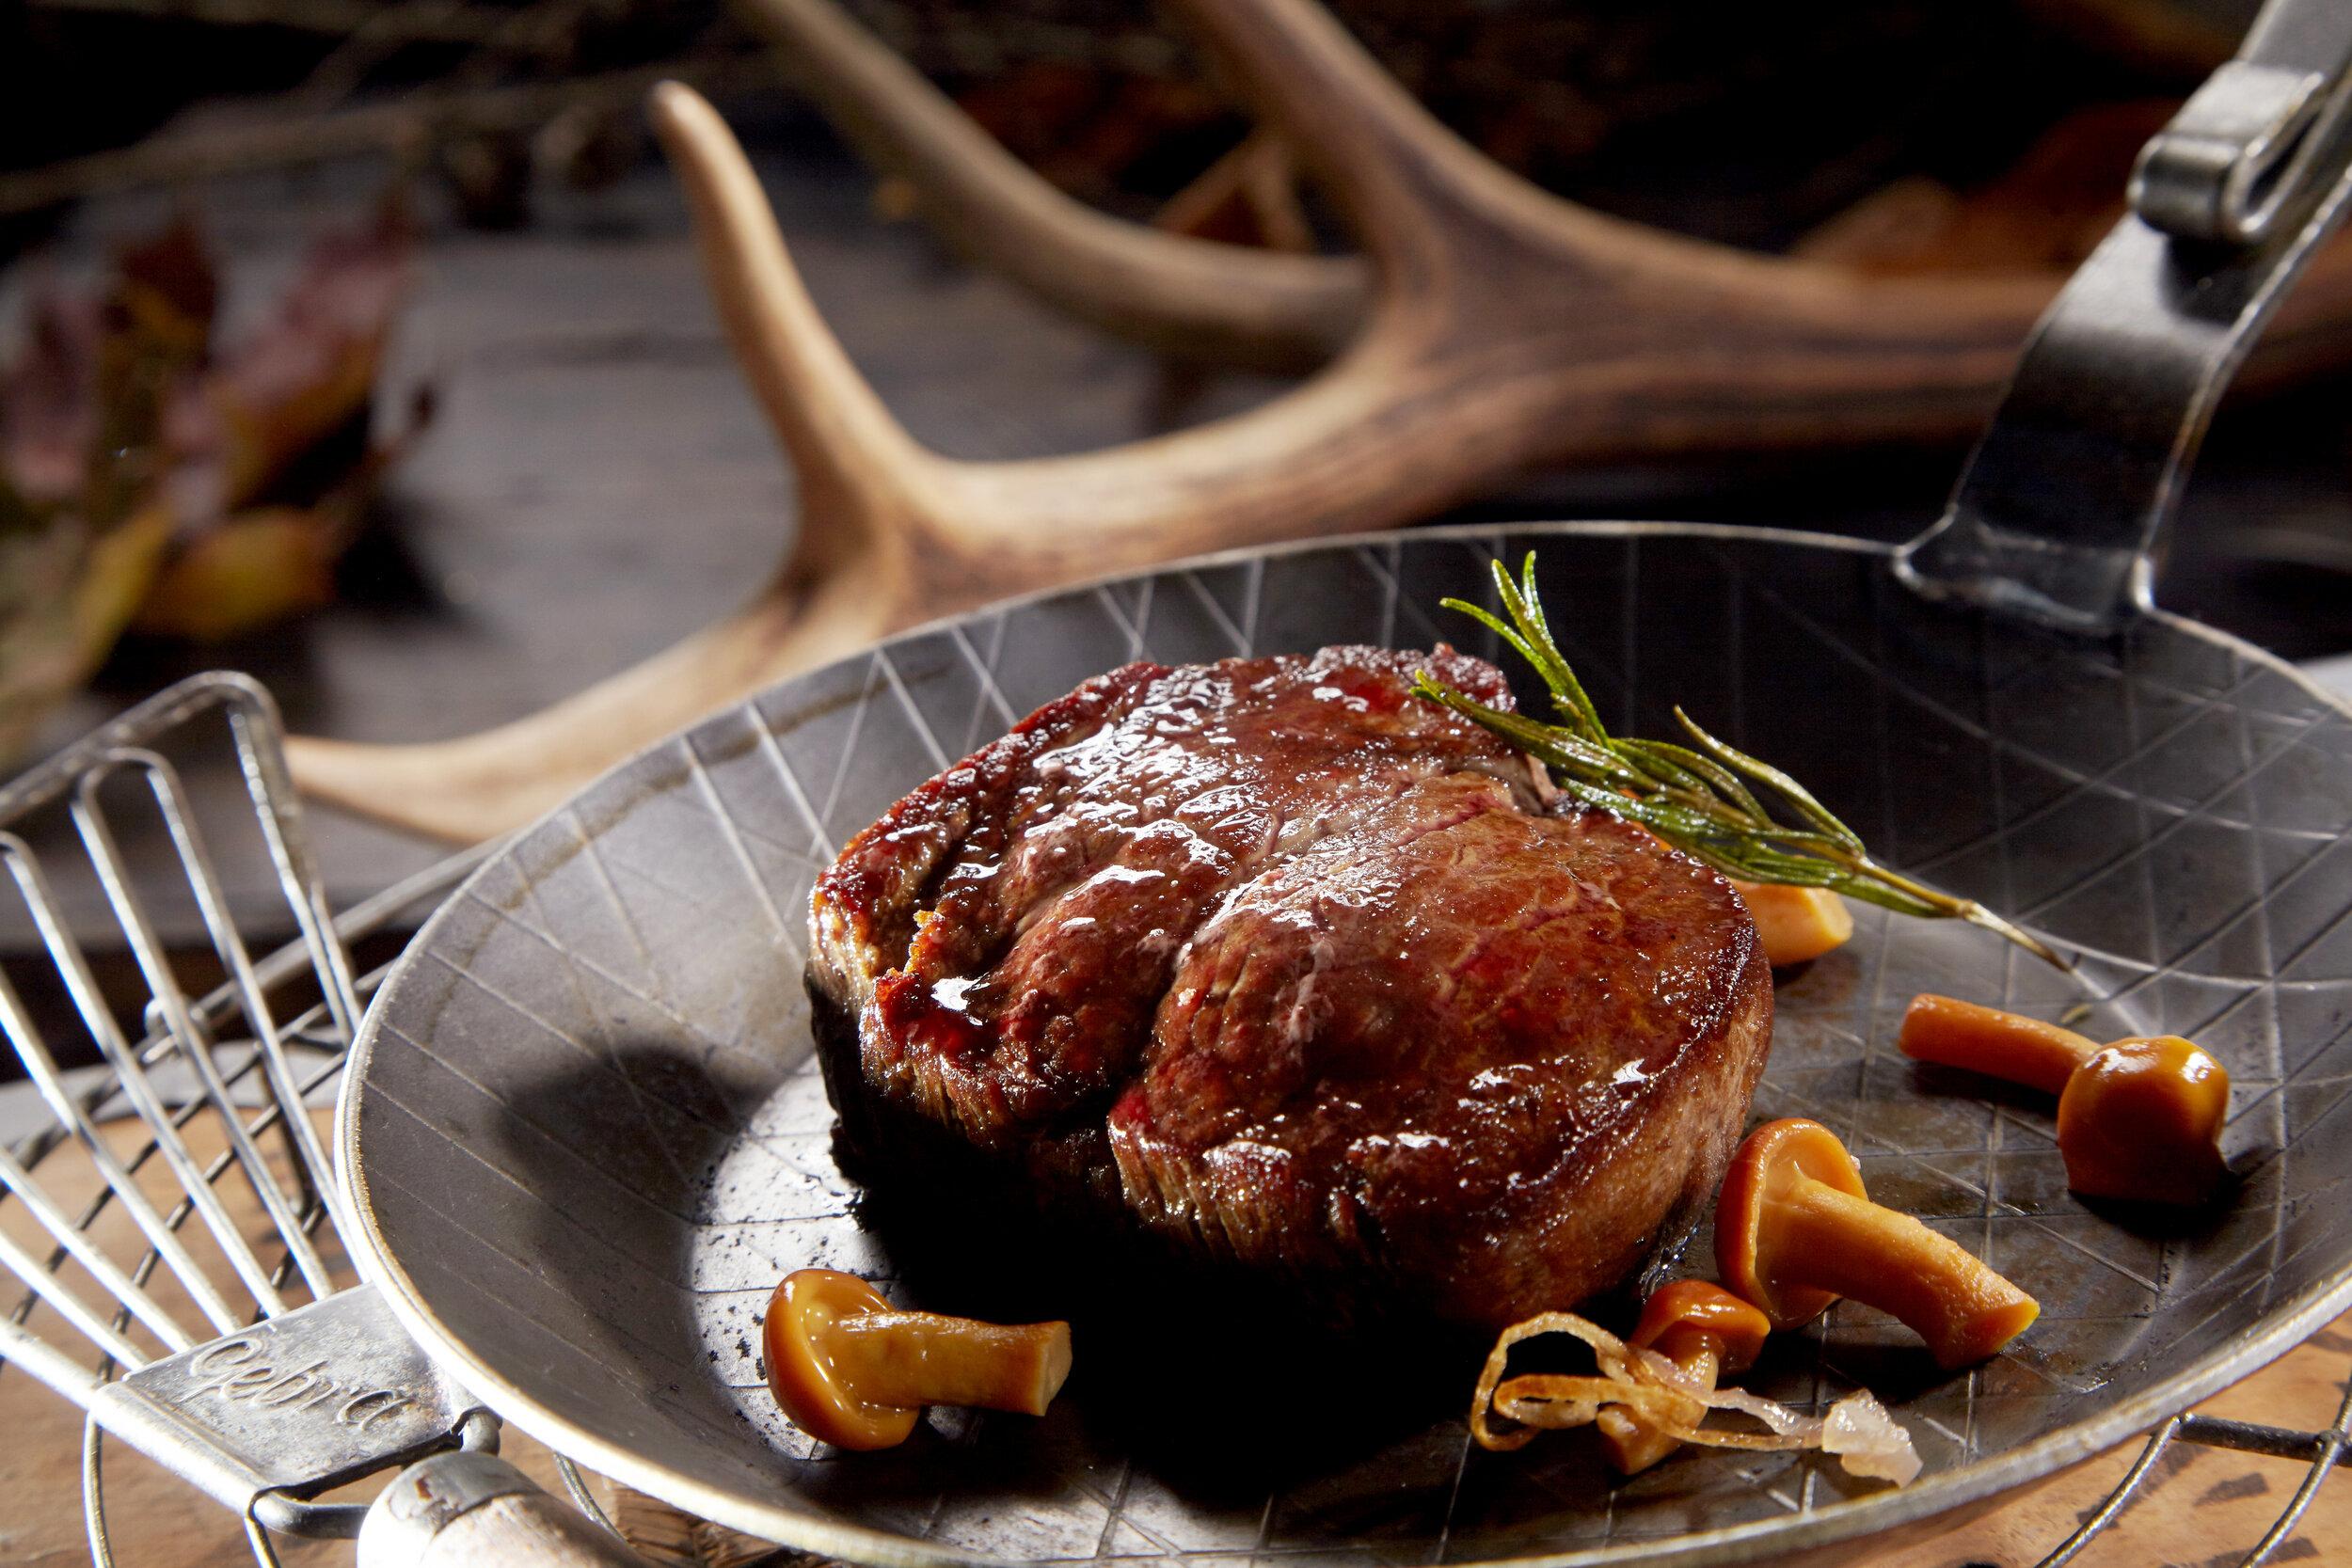 steak in houston texas